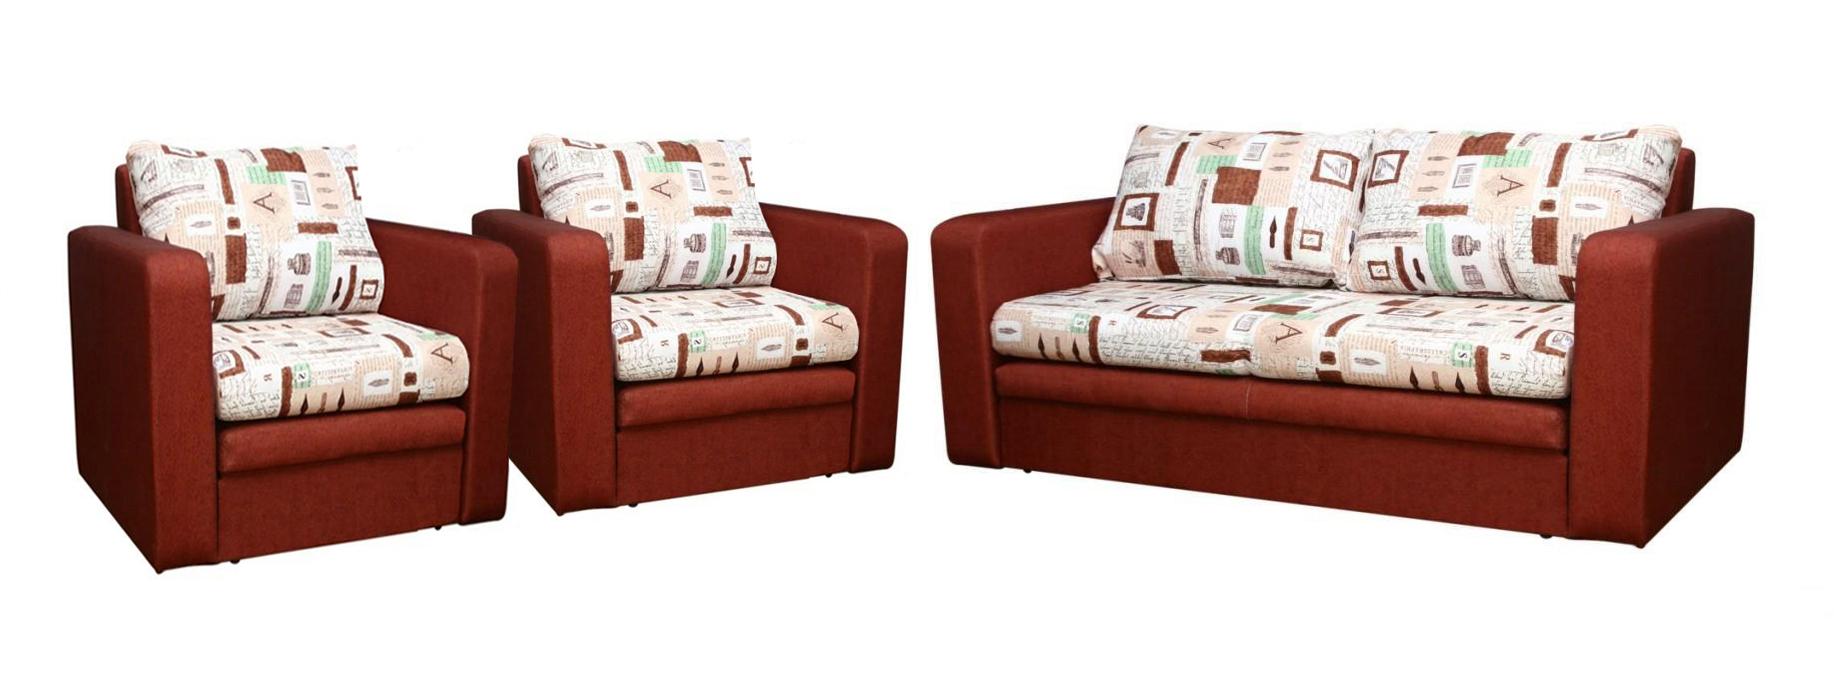 Комплект мягкой мебели Баттерфляй